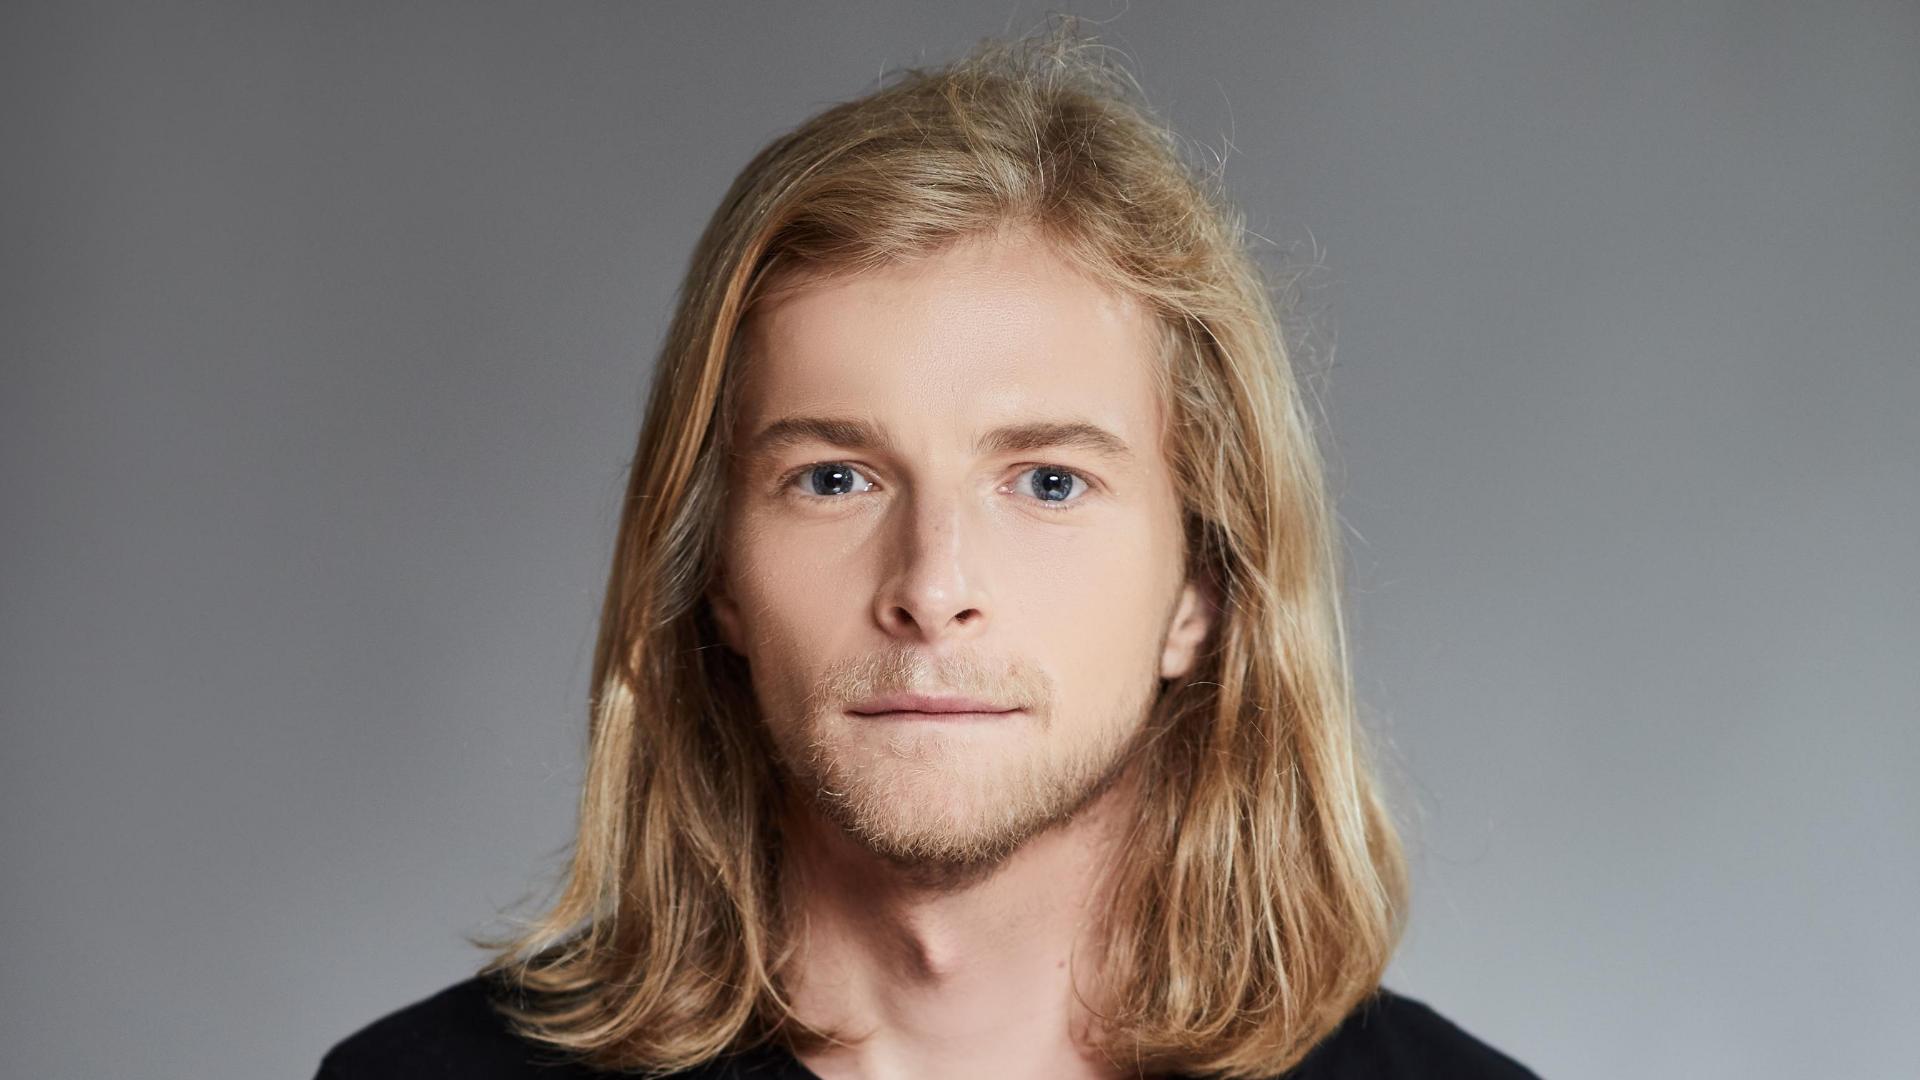 Martin Paršin